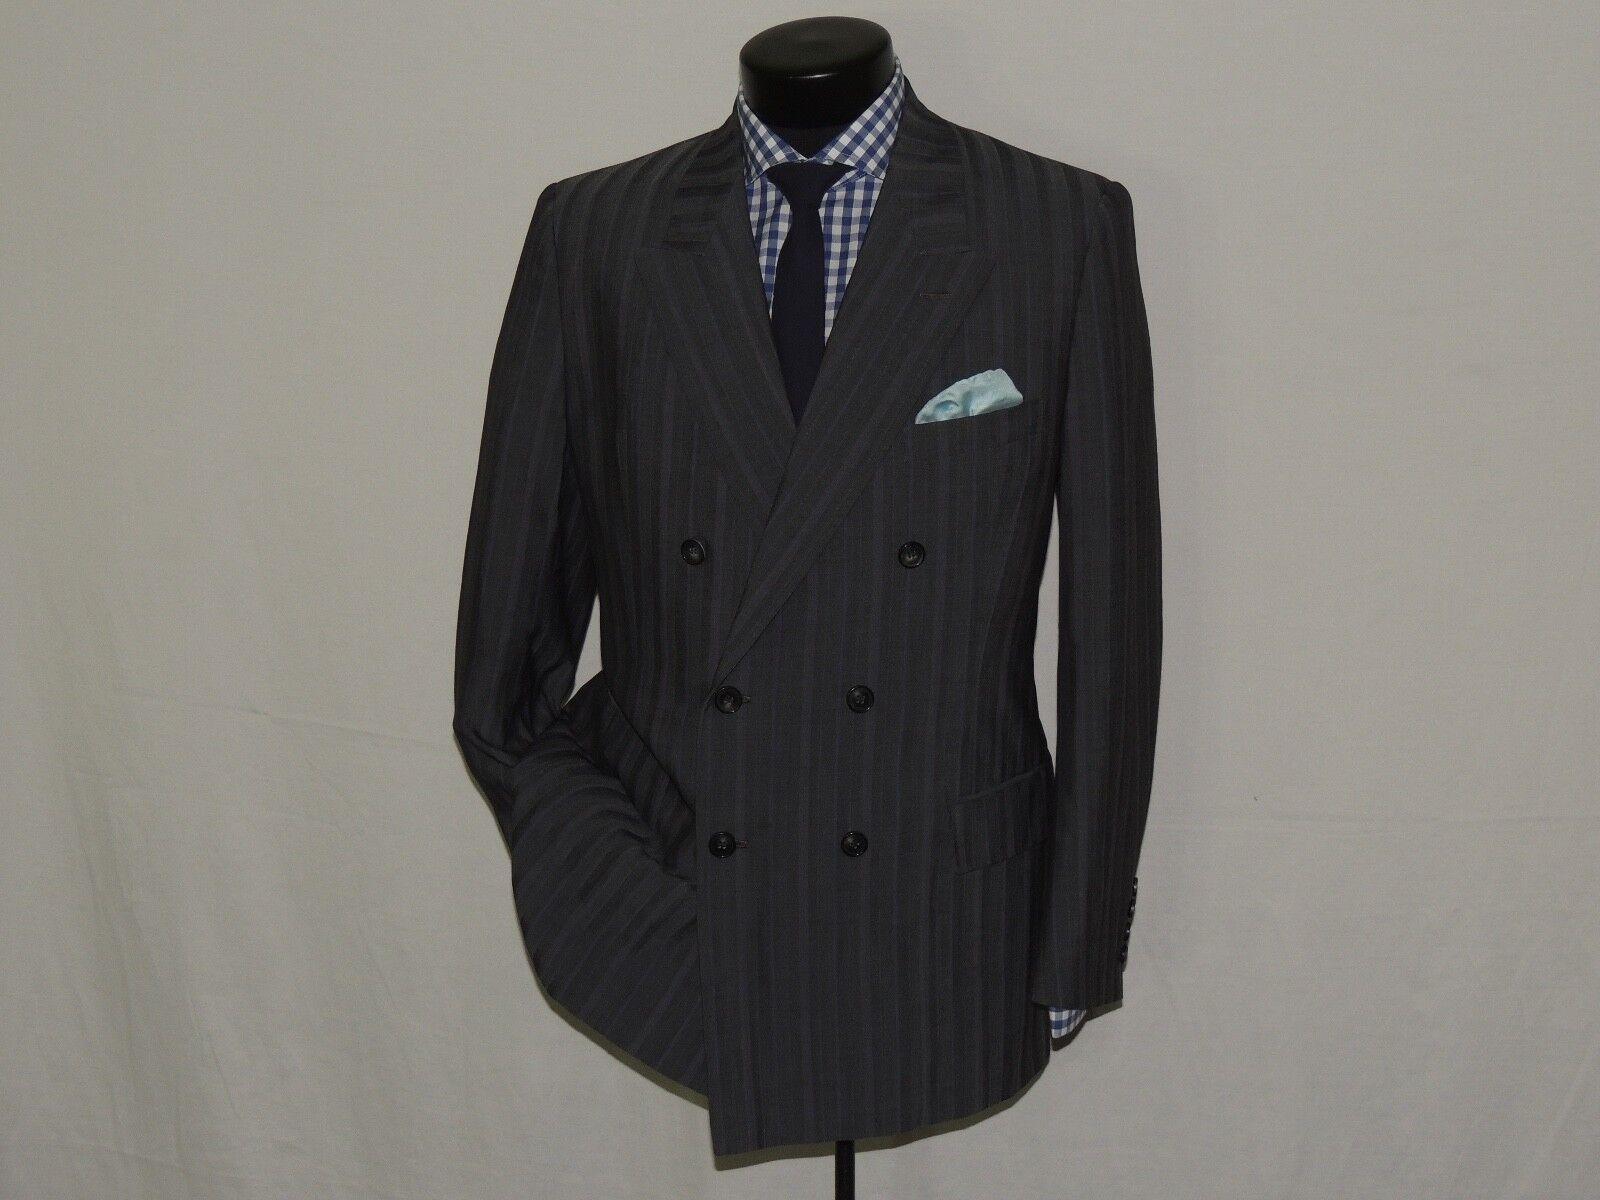 Bespoke Bill Cairo Vtg grau stripe Double Breasted suit coat 38 R pants 32X30.5